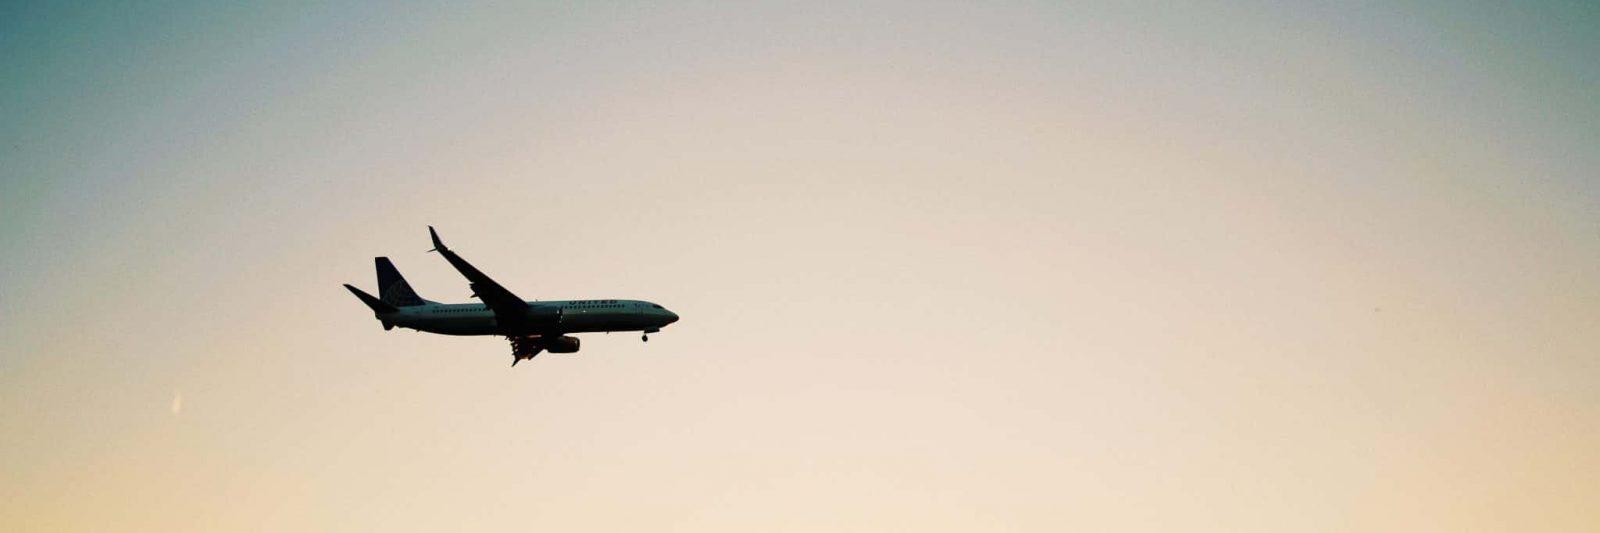 aeroport de montpellier